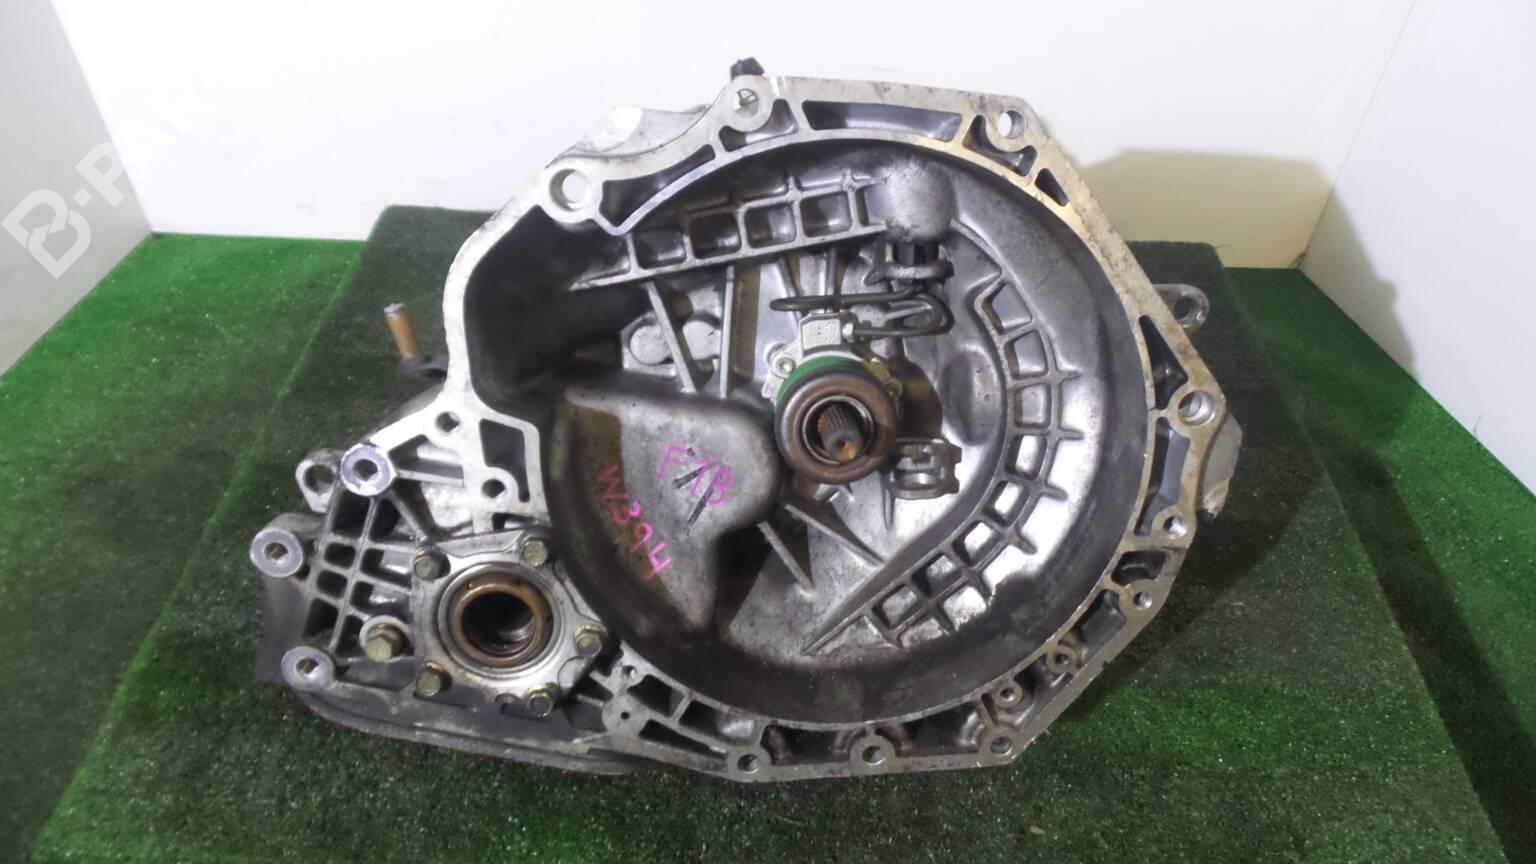 Manual Gearbox F18 W394 OPEL, ASTRA G Estate (F35_) 2.0 16V(5